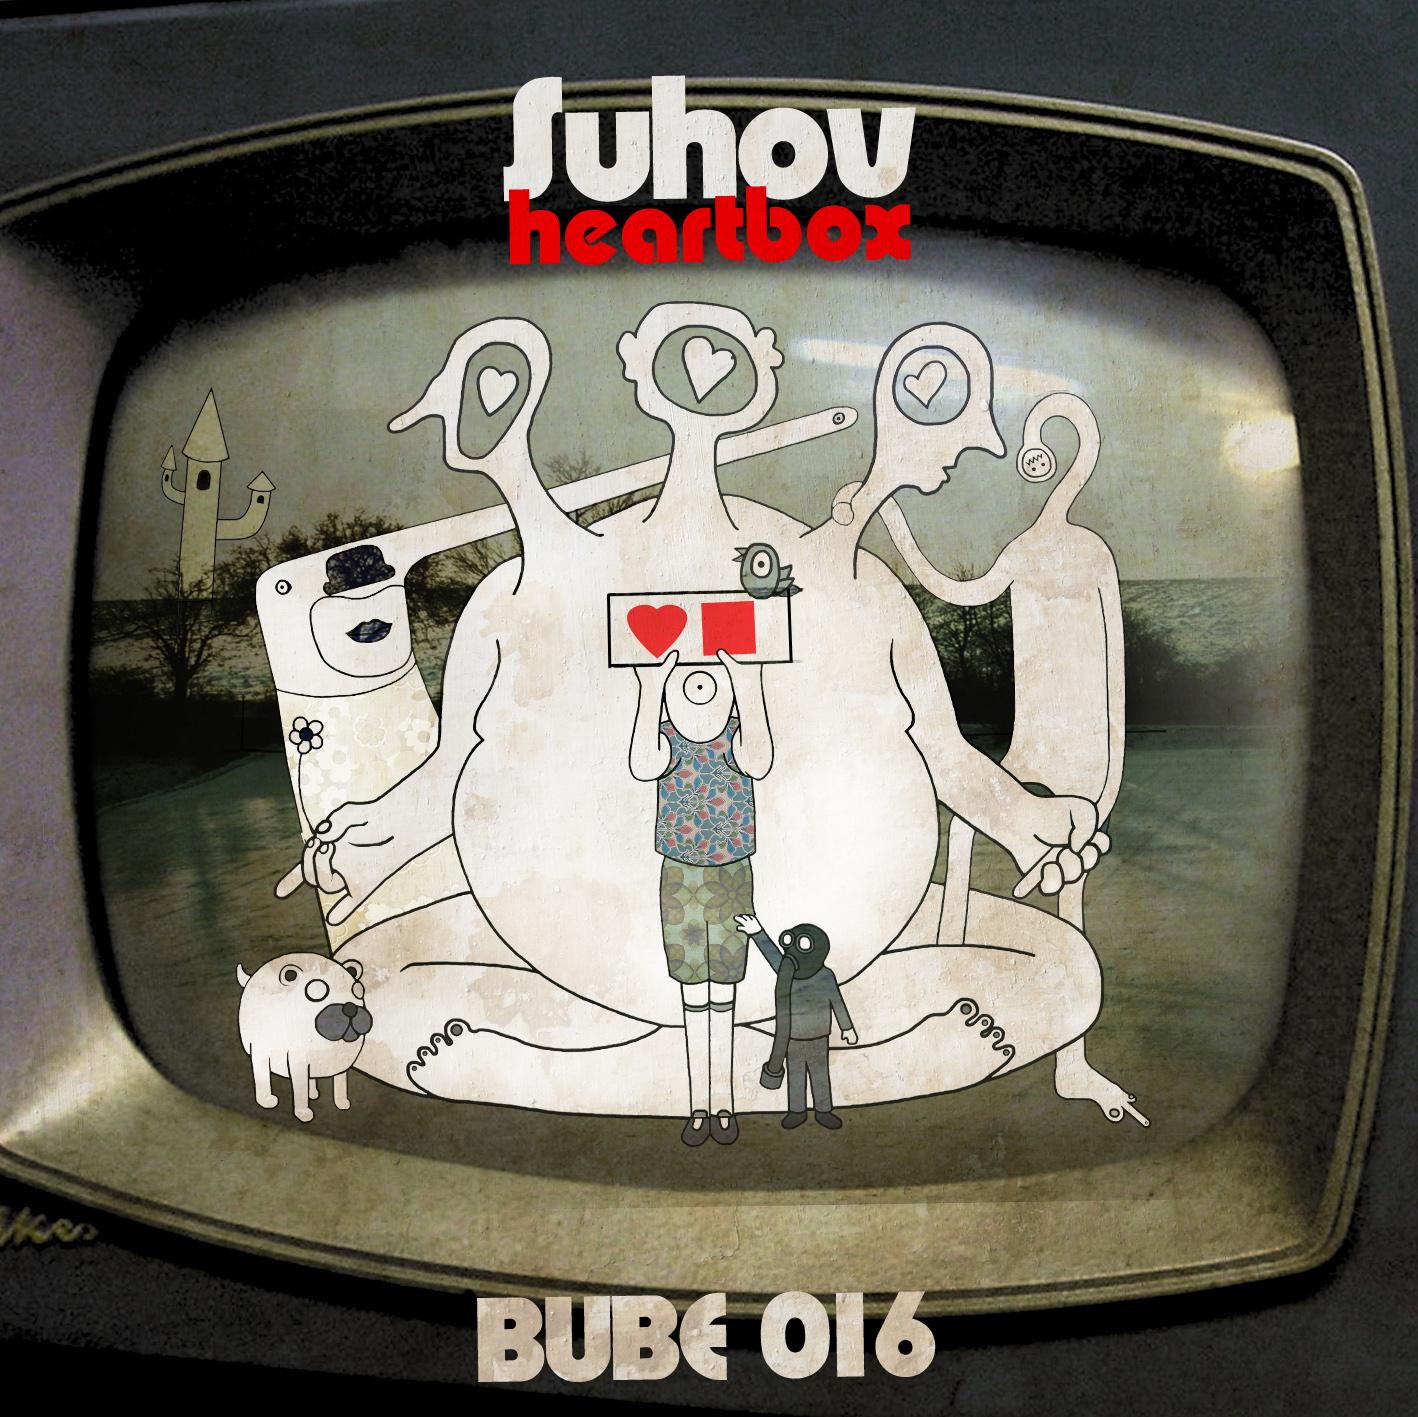 bube016_front.jpg